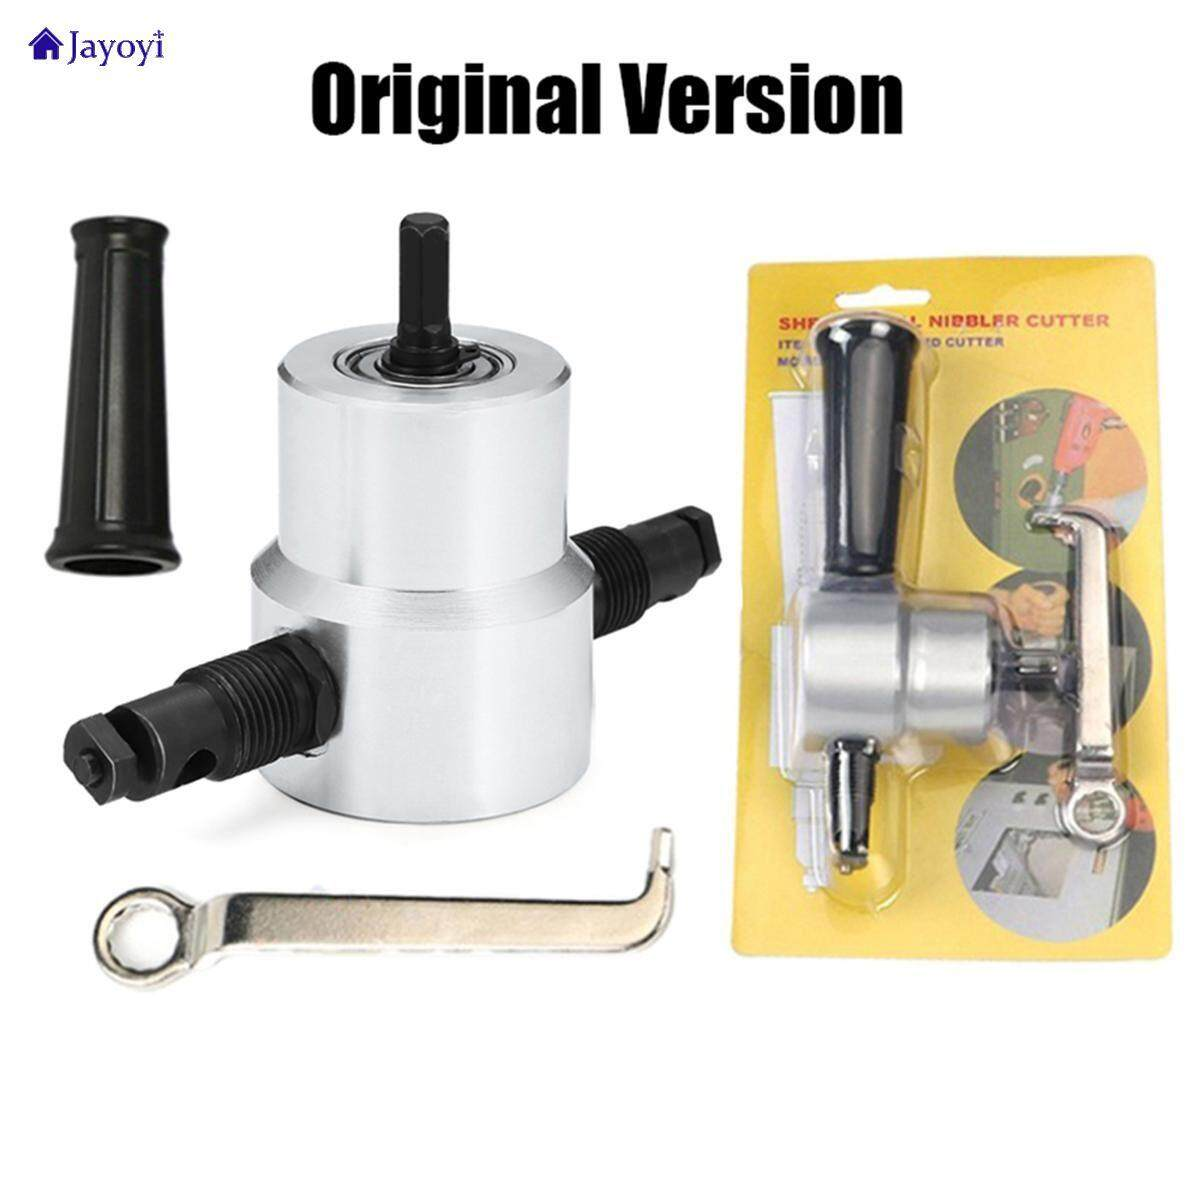 Jayoyi Nibble Metal Cutting Double Head drill tool metal accessory metal sheet machine